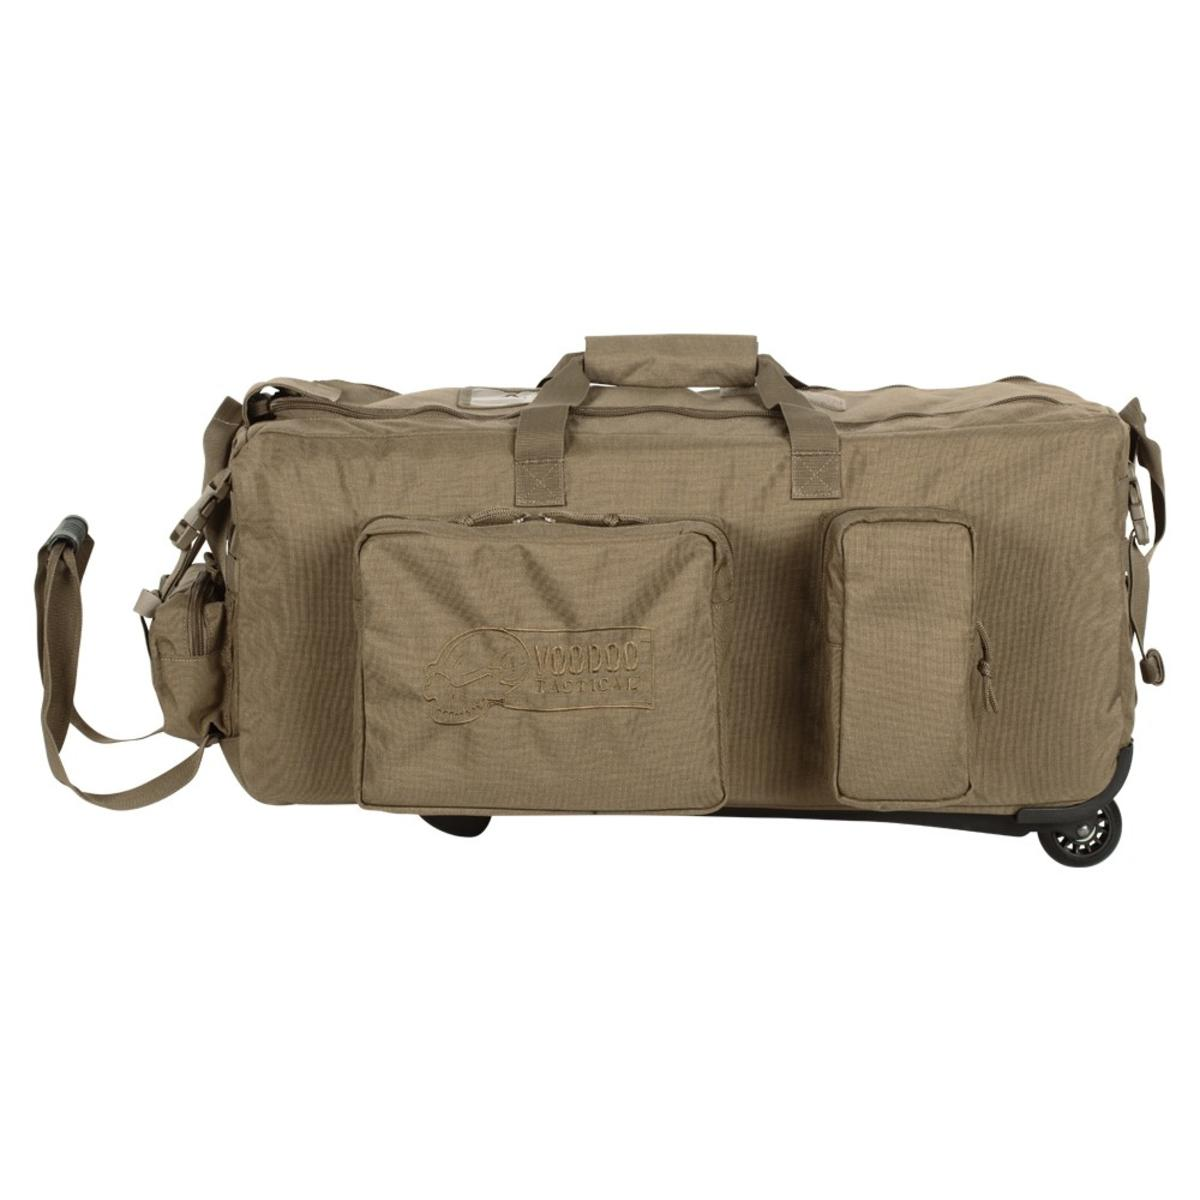 voodoo tactical 15 9687 mini mojo load out bag on wheels w. Black Bedroom Furniture Sets. Home Design Ideas